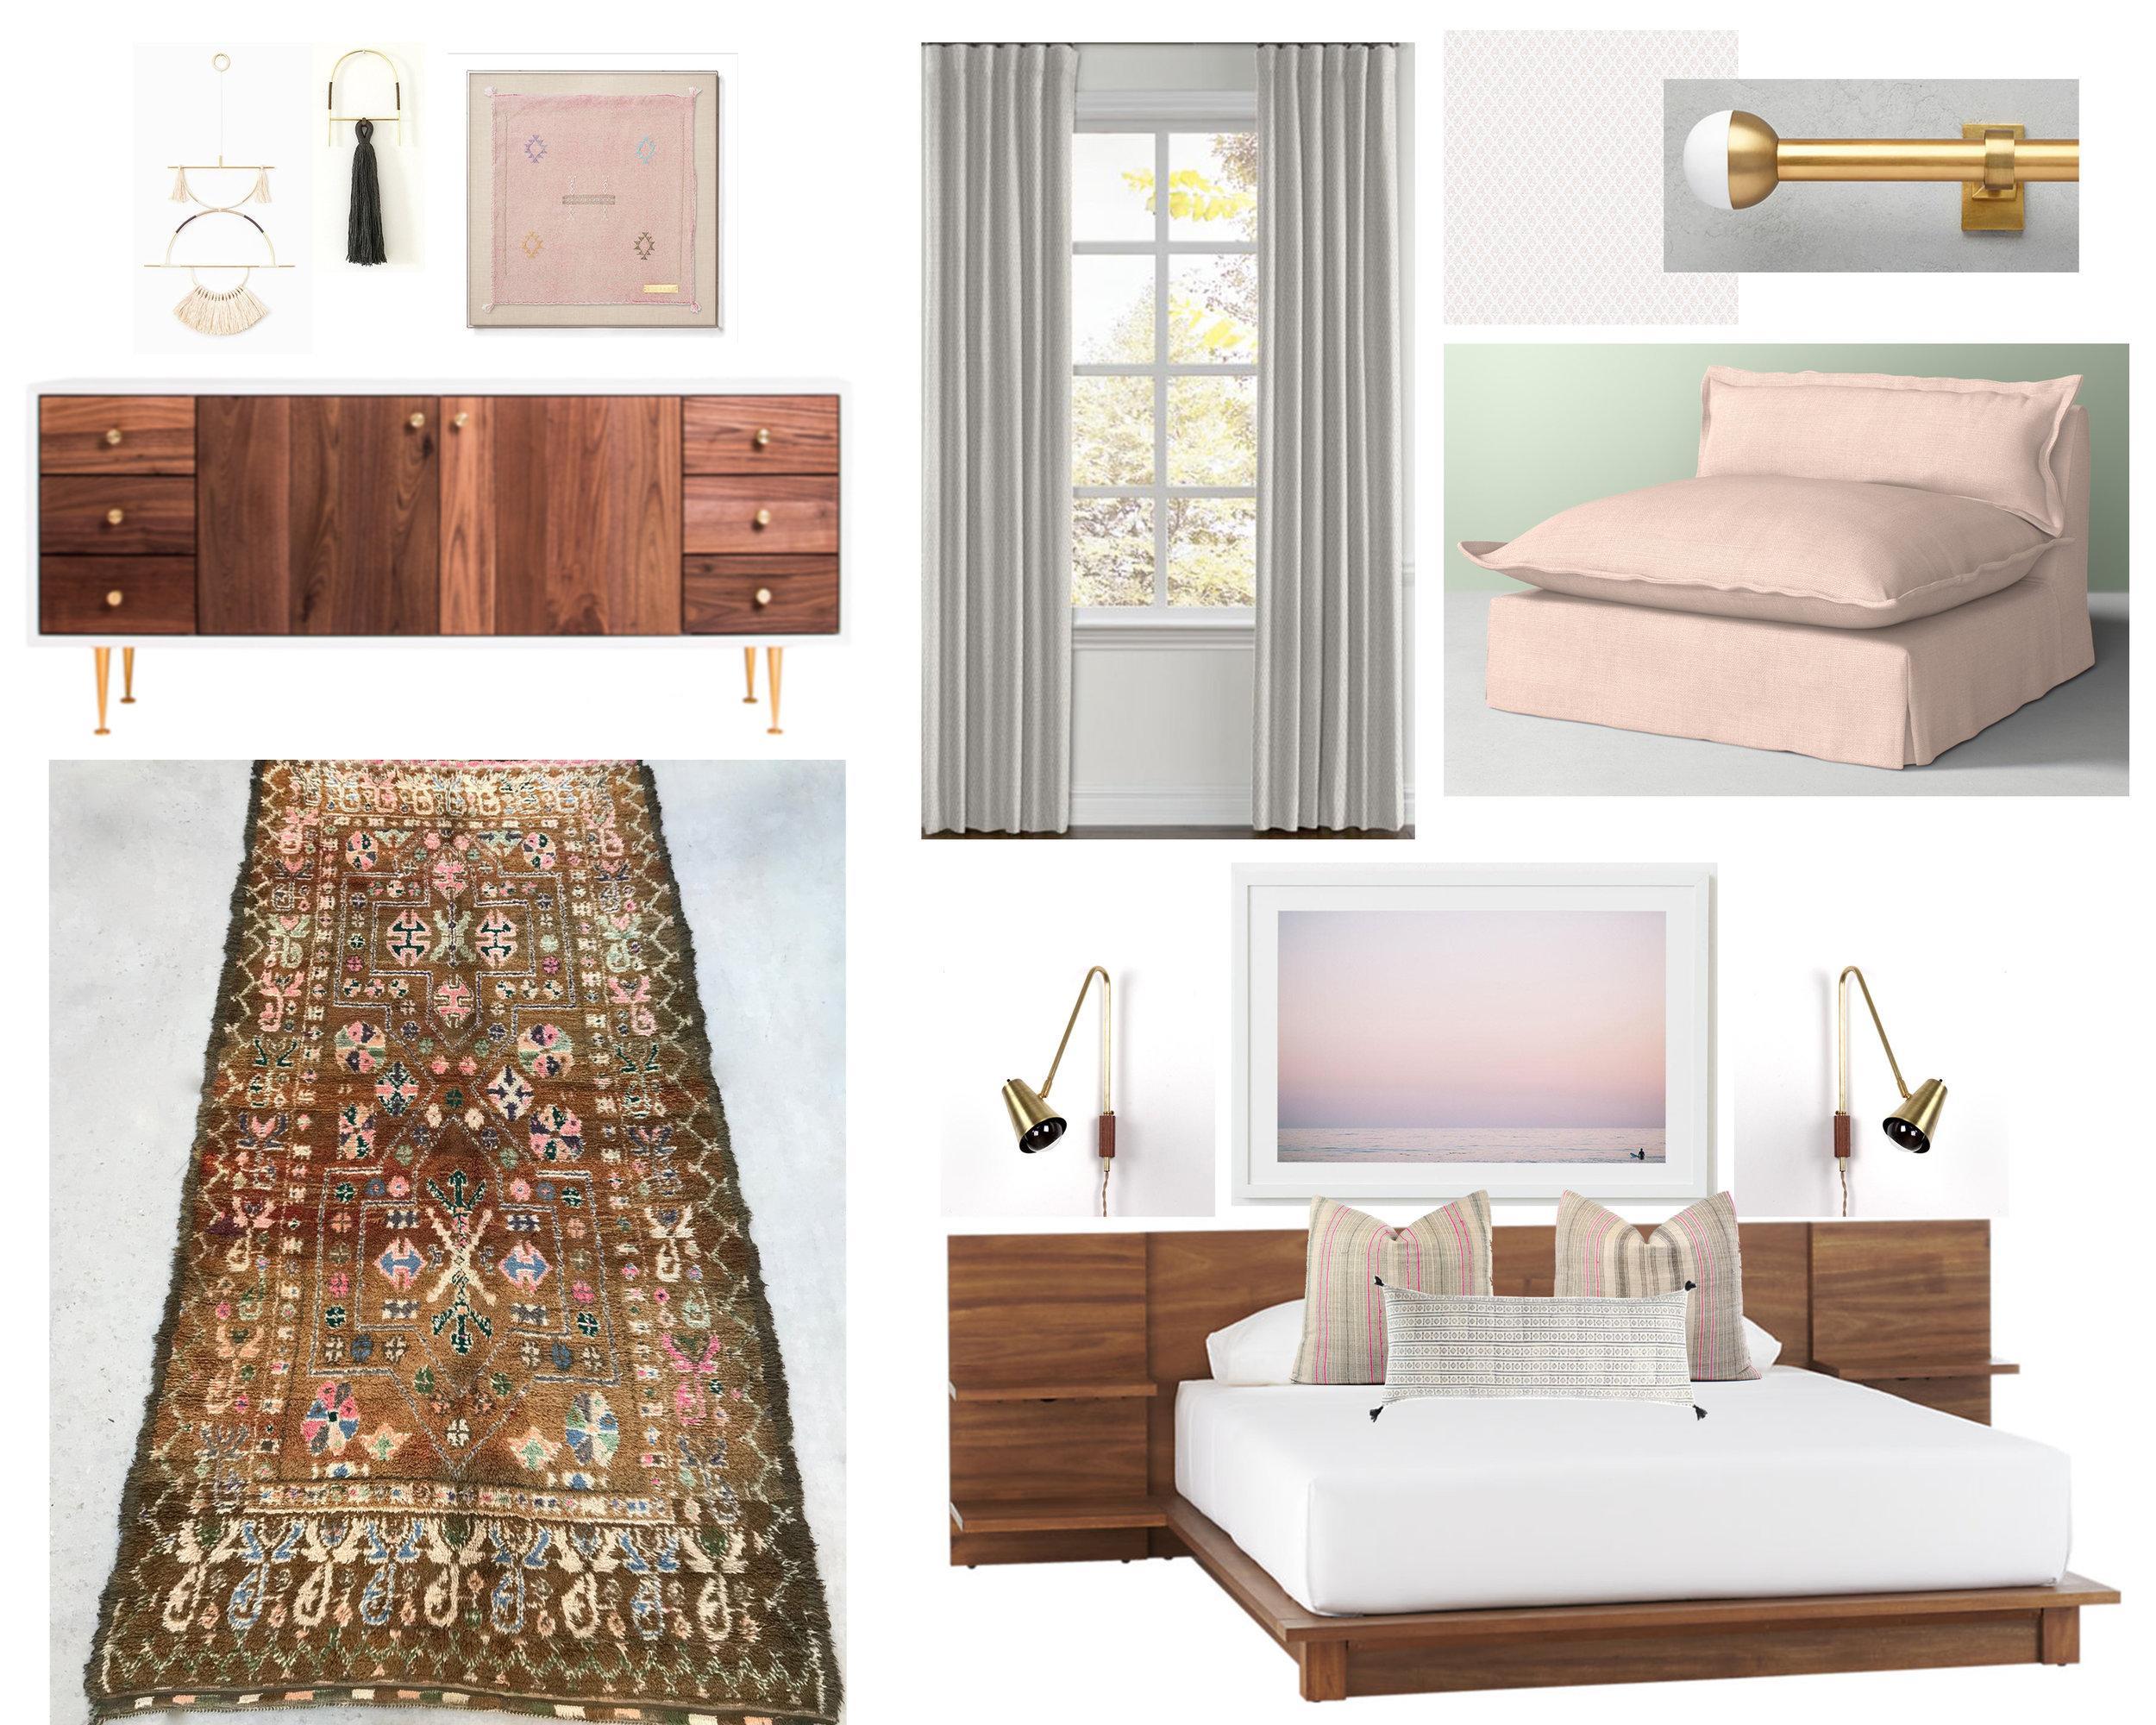 Boho Bachelorette Bedroom 12.11.17.jpg